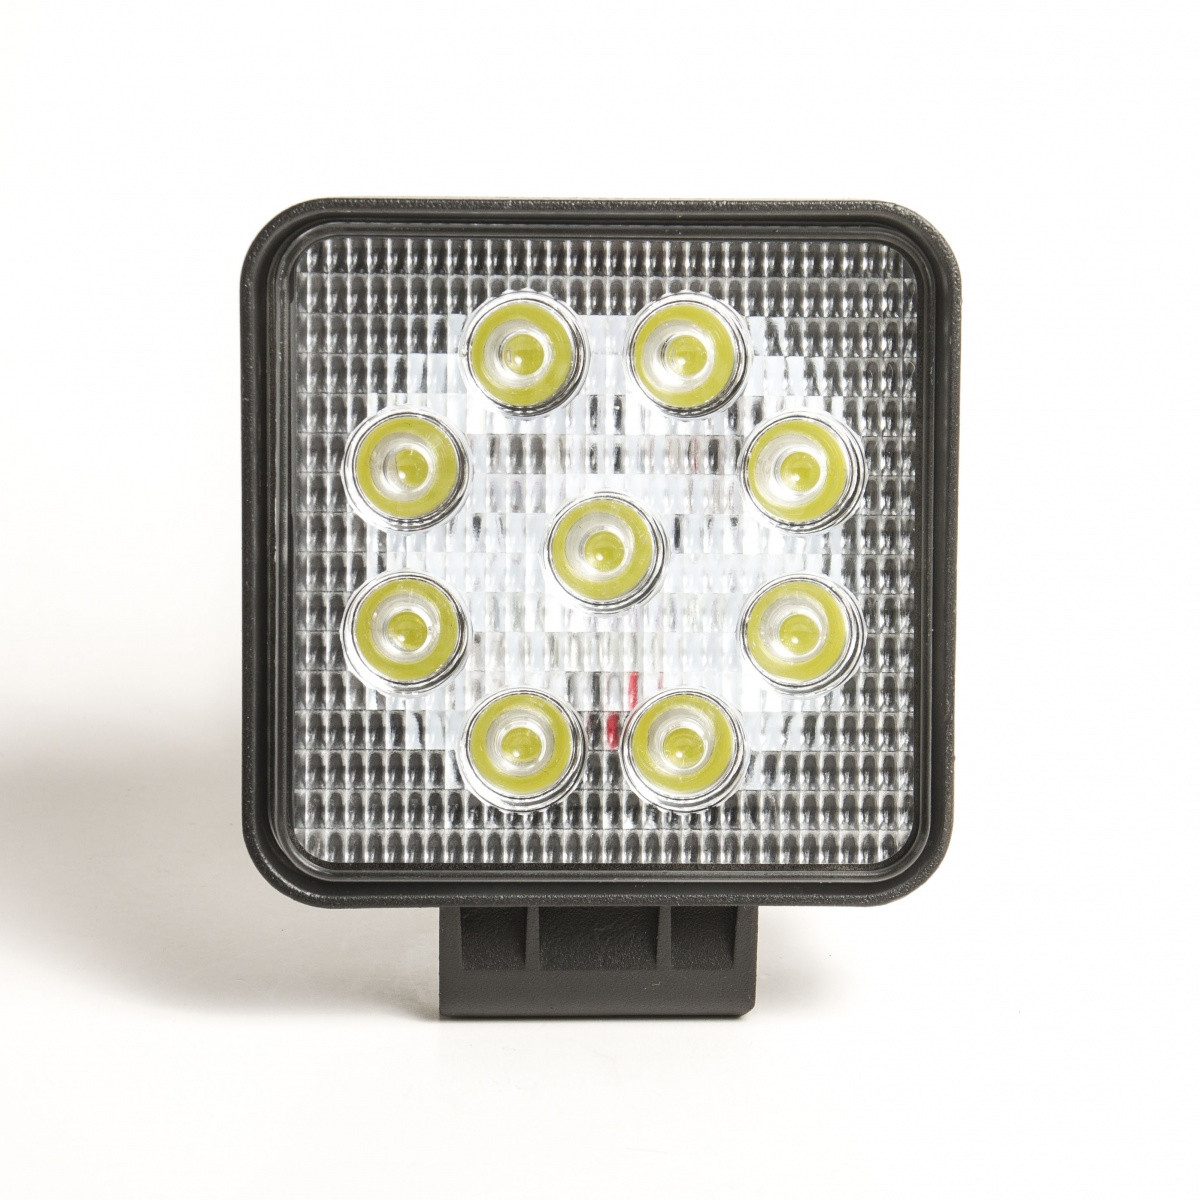 Светодиодная LED фара 3W*9 27Вт. IP67 12В, 24В 2700 lms